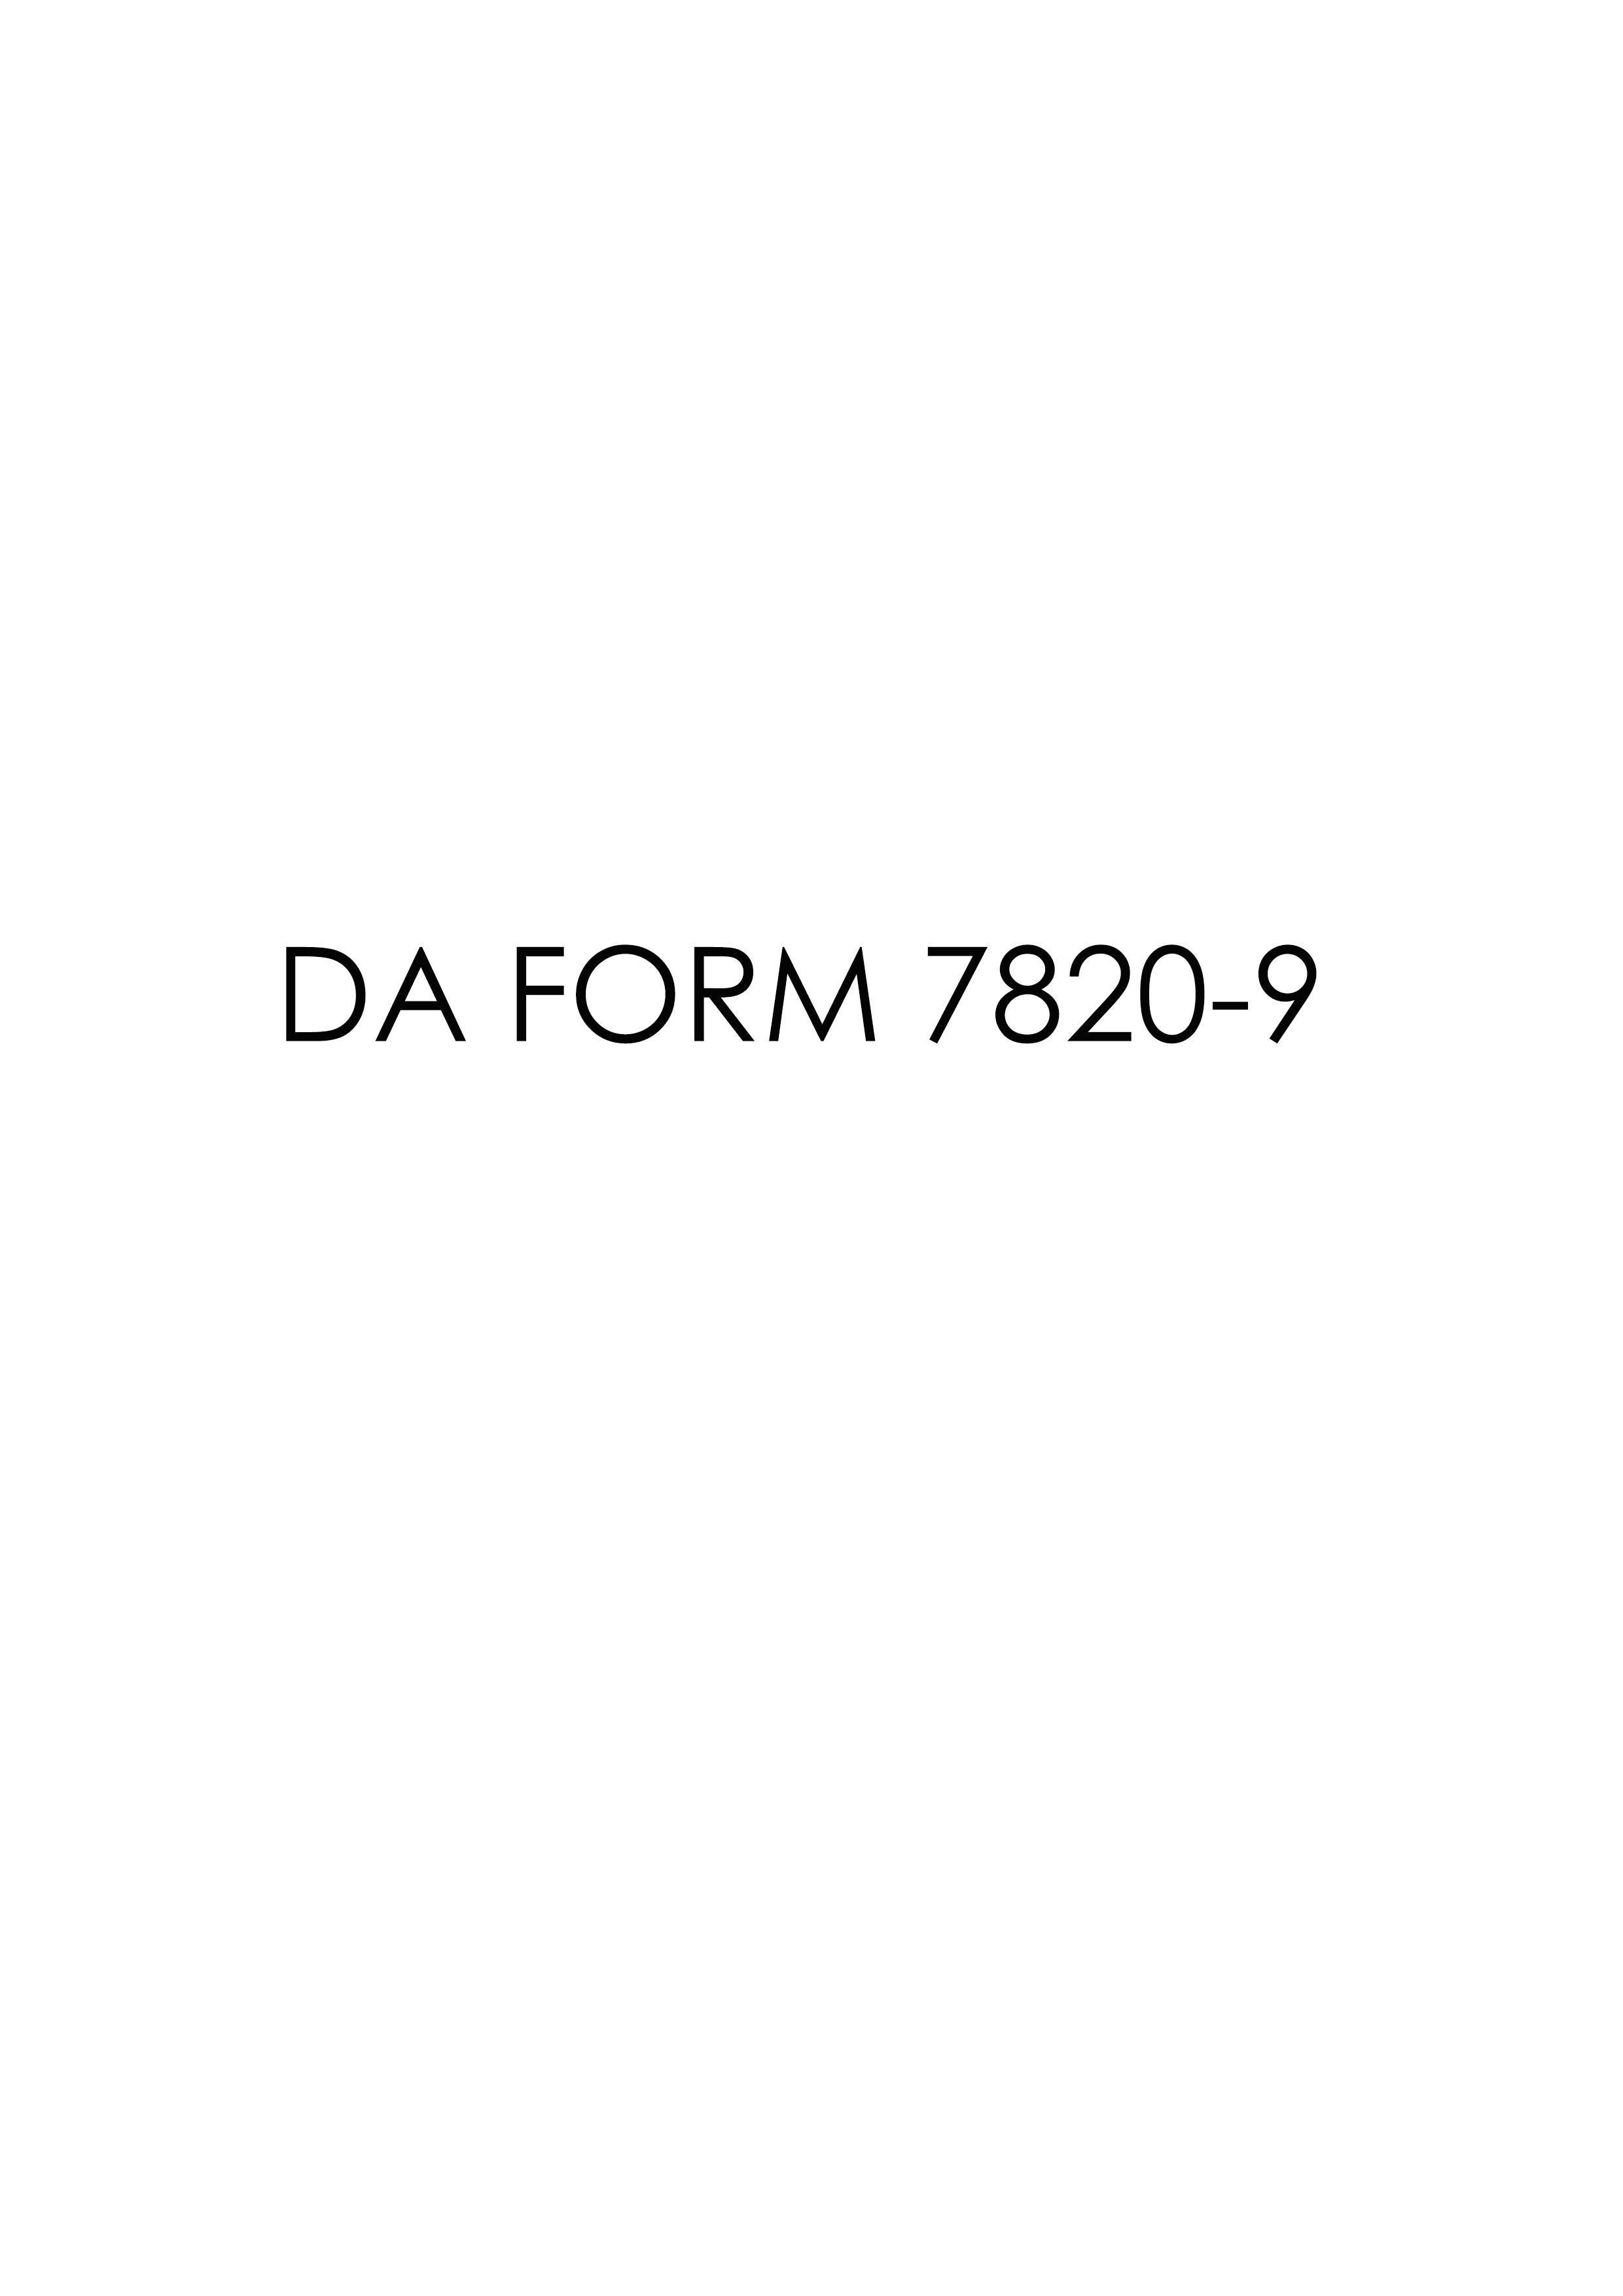 Download da Form 7820-9 Free